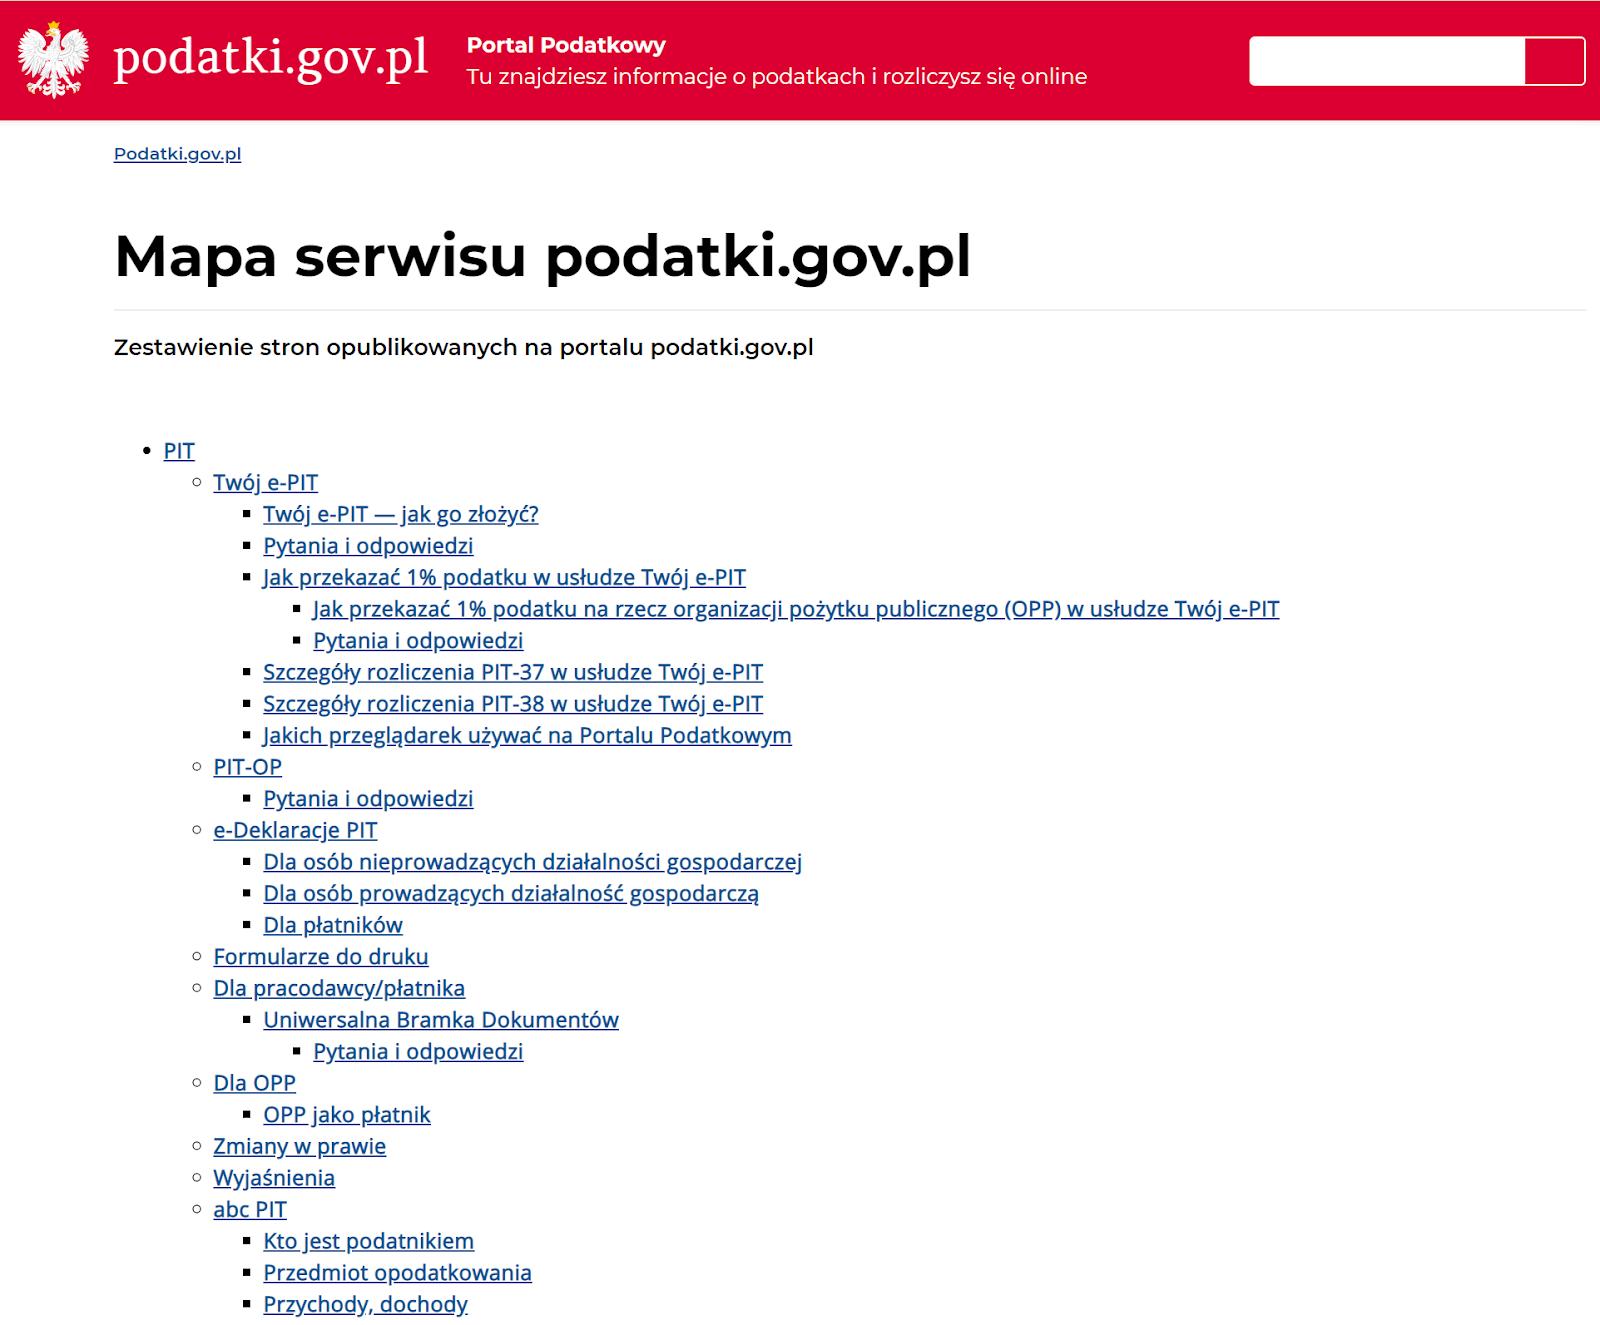 sitemap html